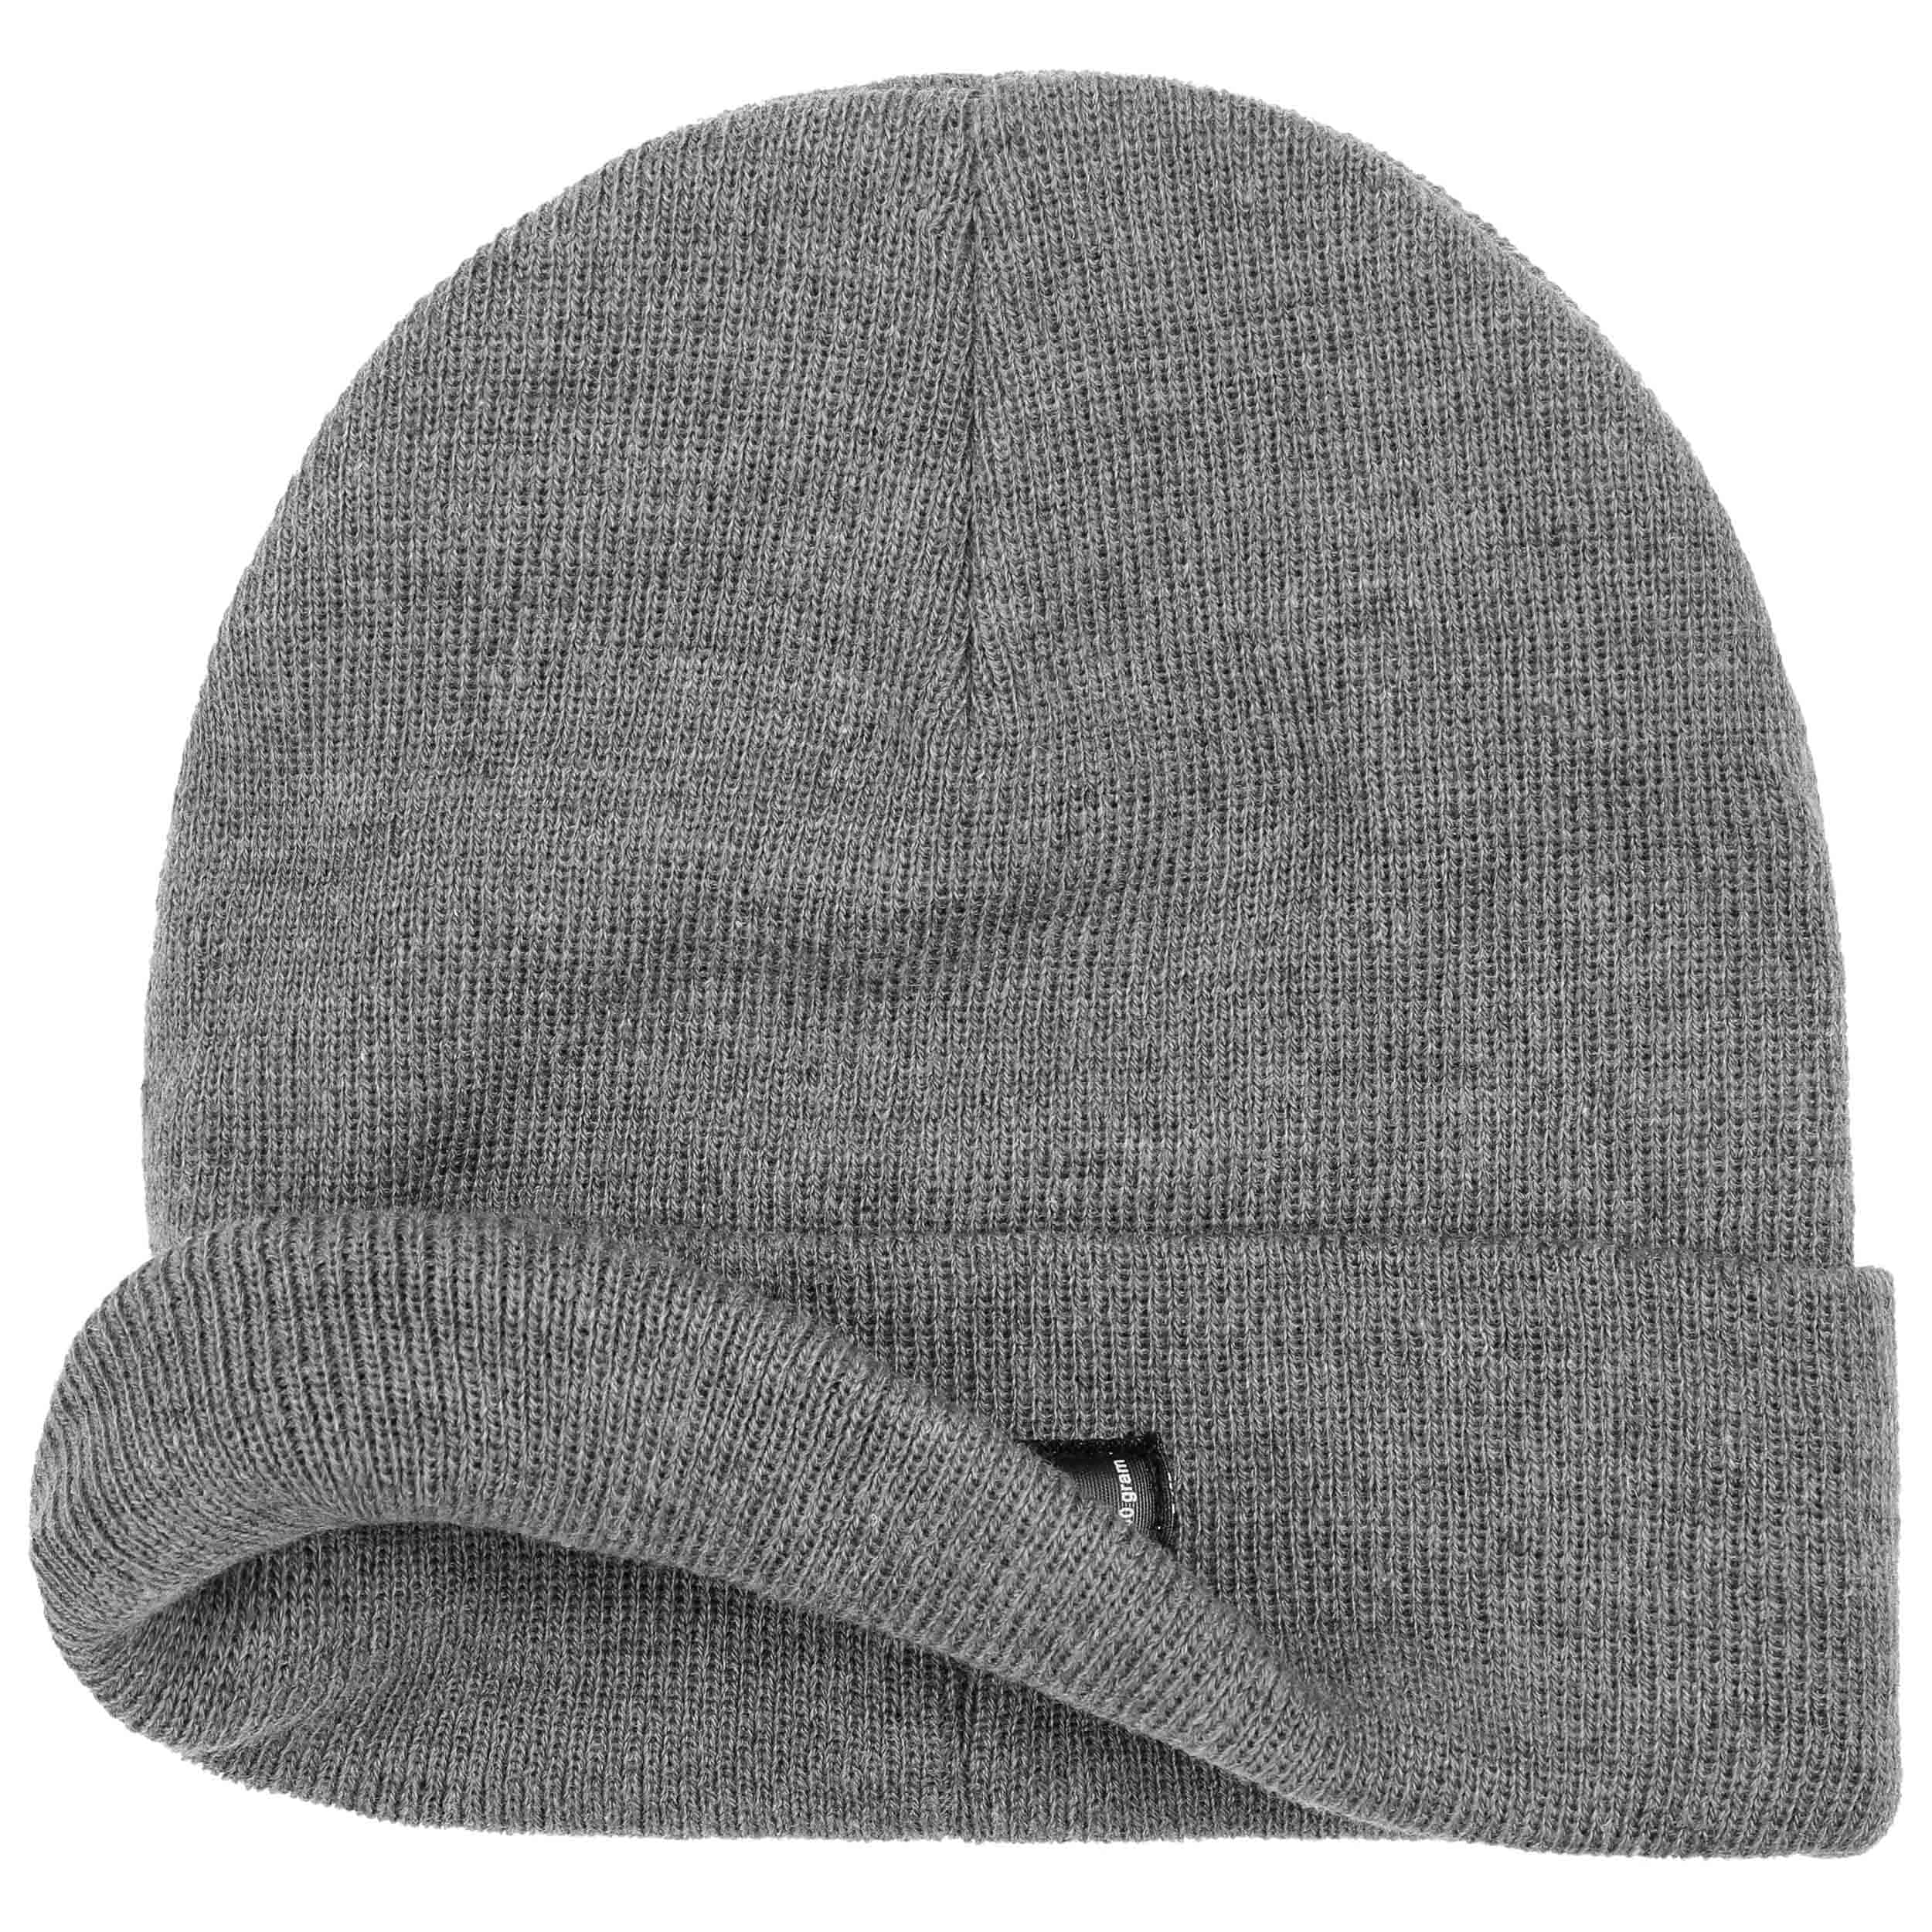 f064b02da9165 Thinsulate 3M Beanie Knit Hat with Cuff - grey 1 ...